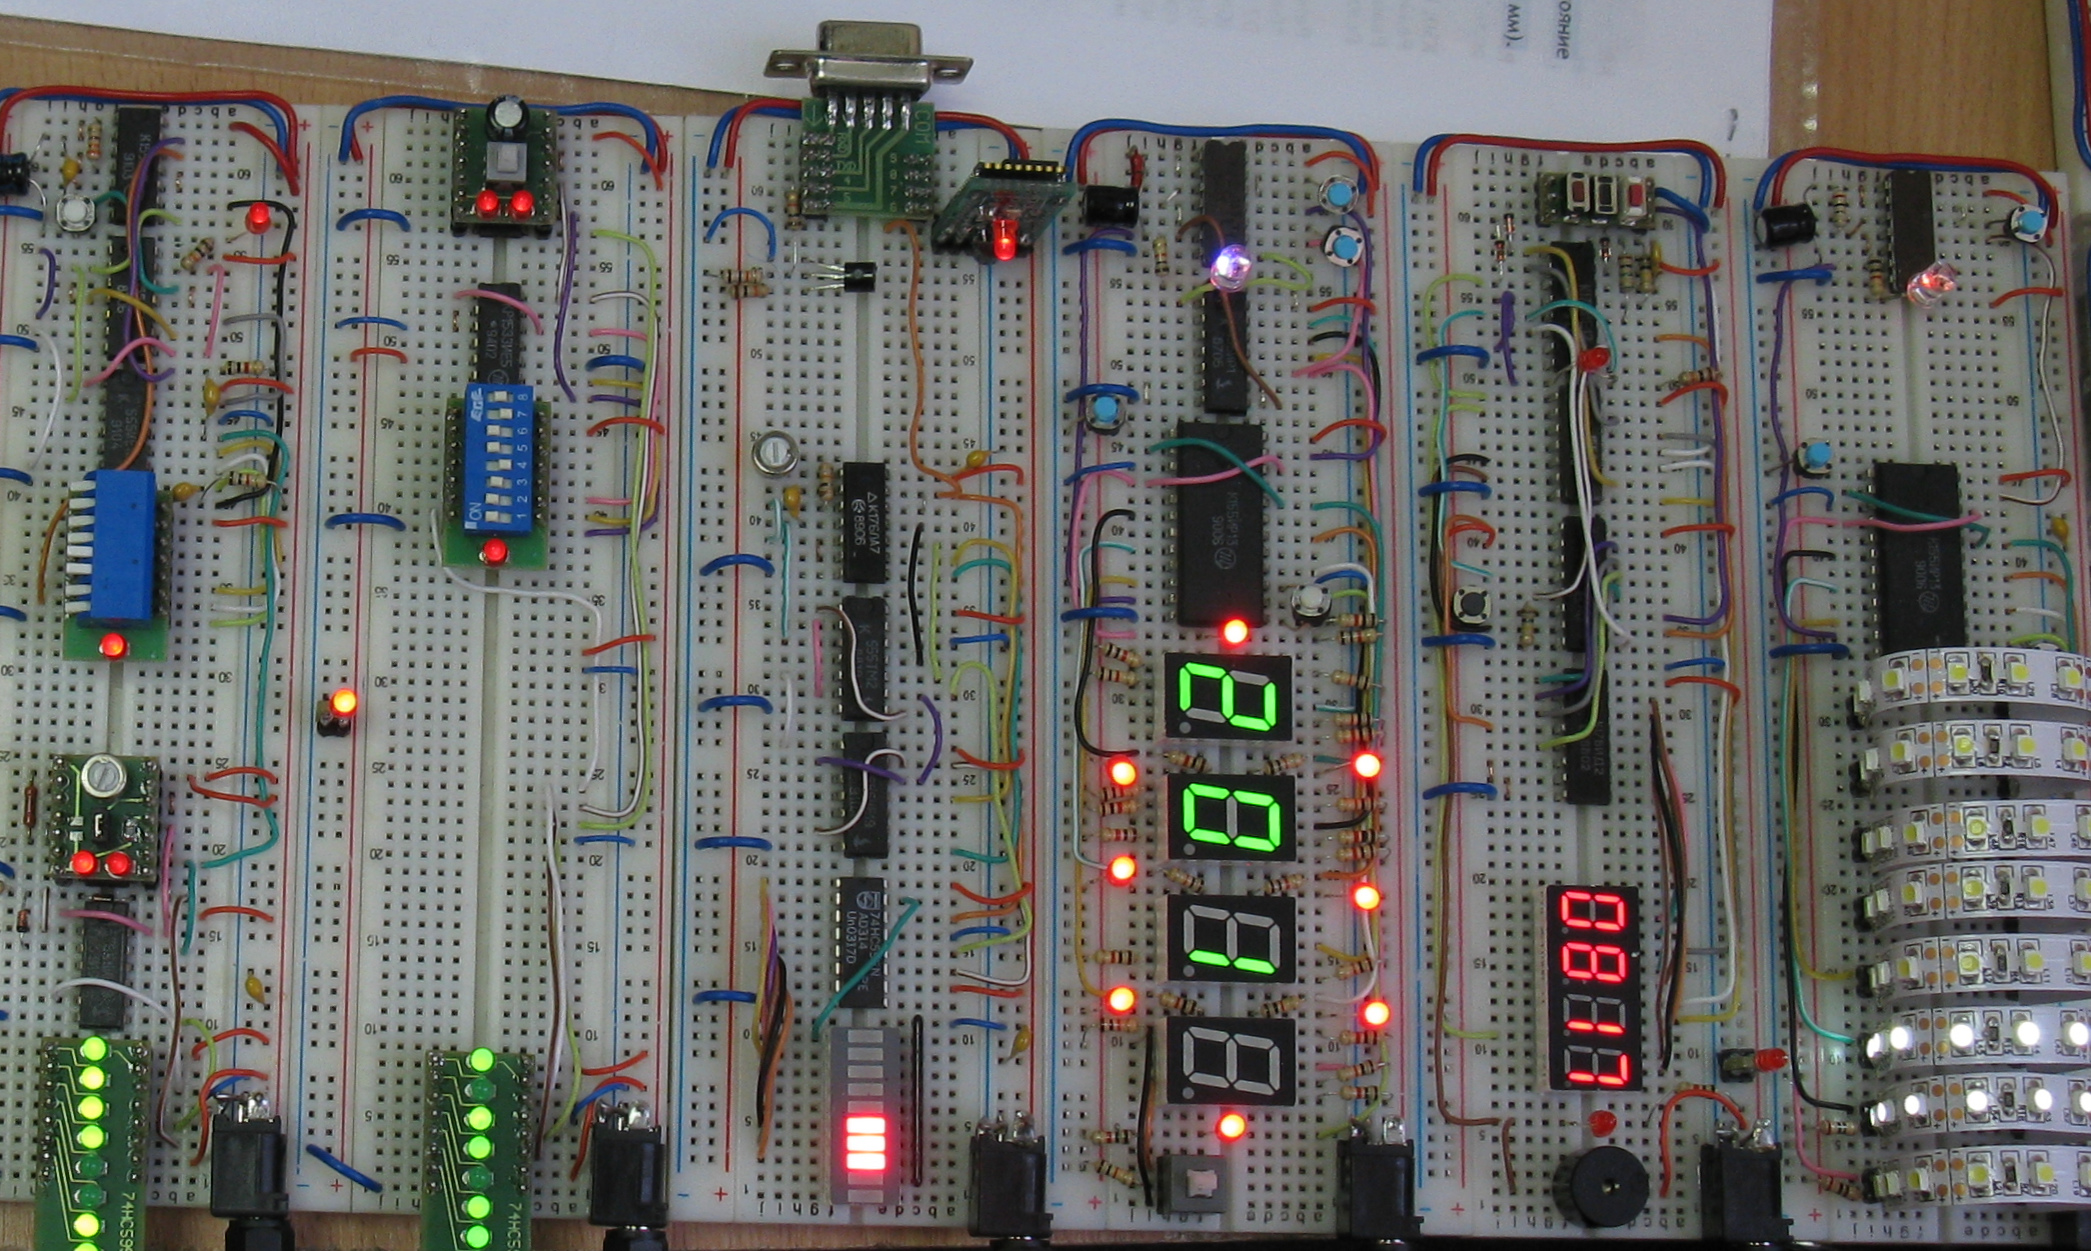 Кружок электроники: программа занятий